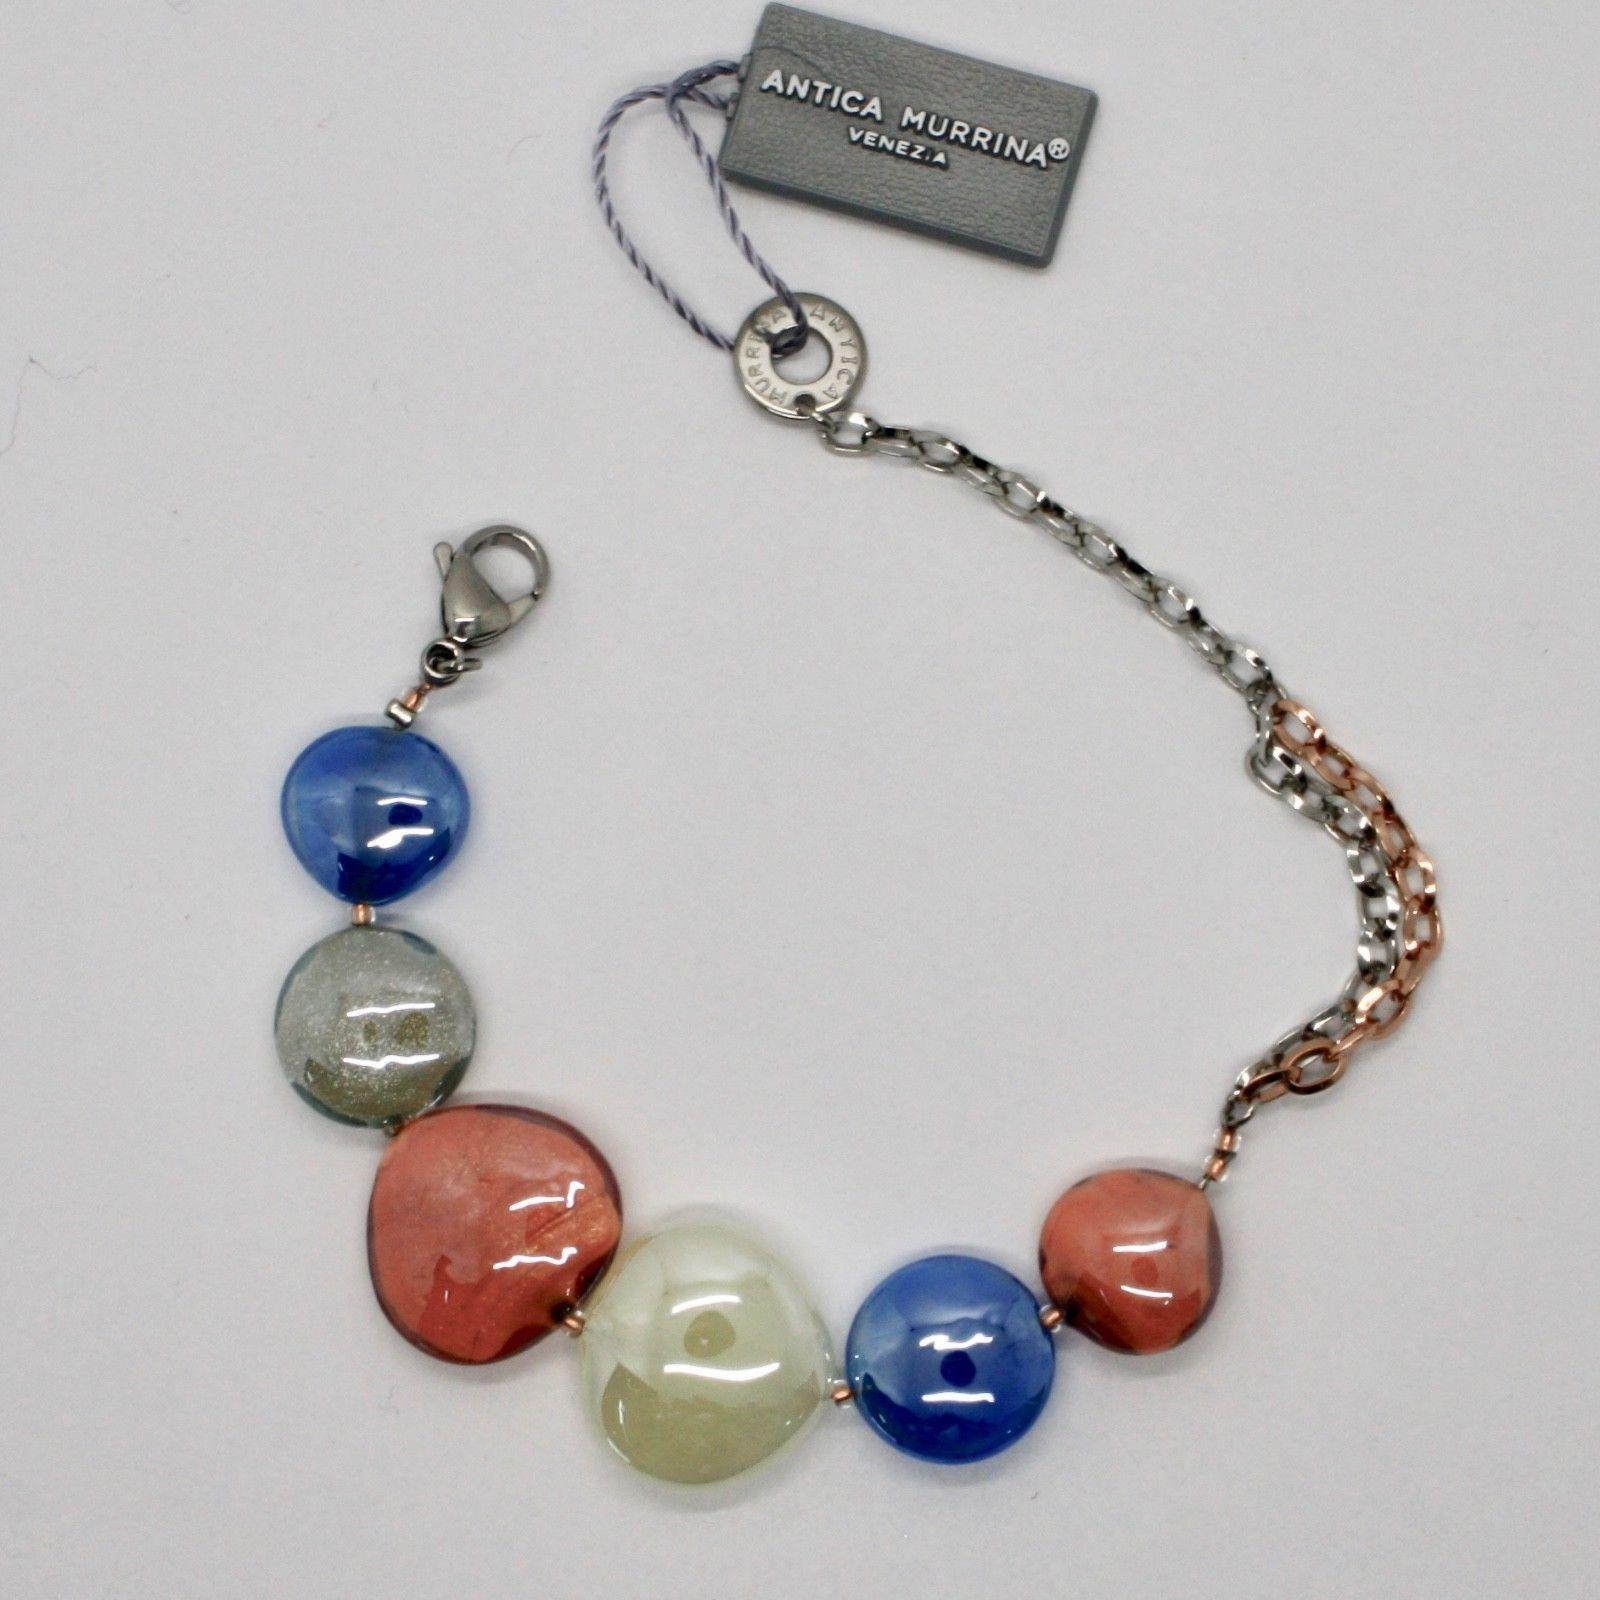 BRACELET ANTICA MURRINA VENEZIA WITH MURANO GLASS ORANGE BLUE BEIGE BR800A46